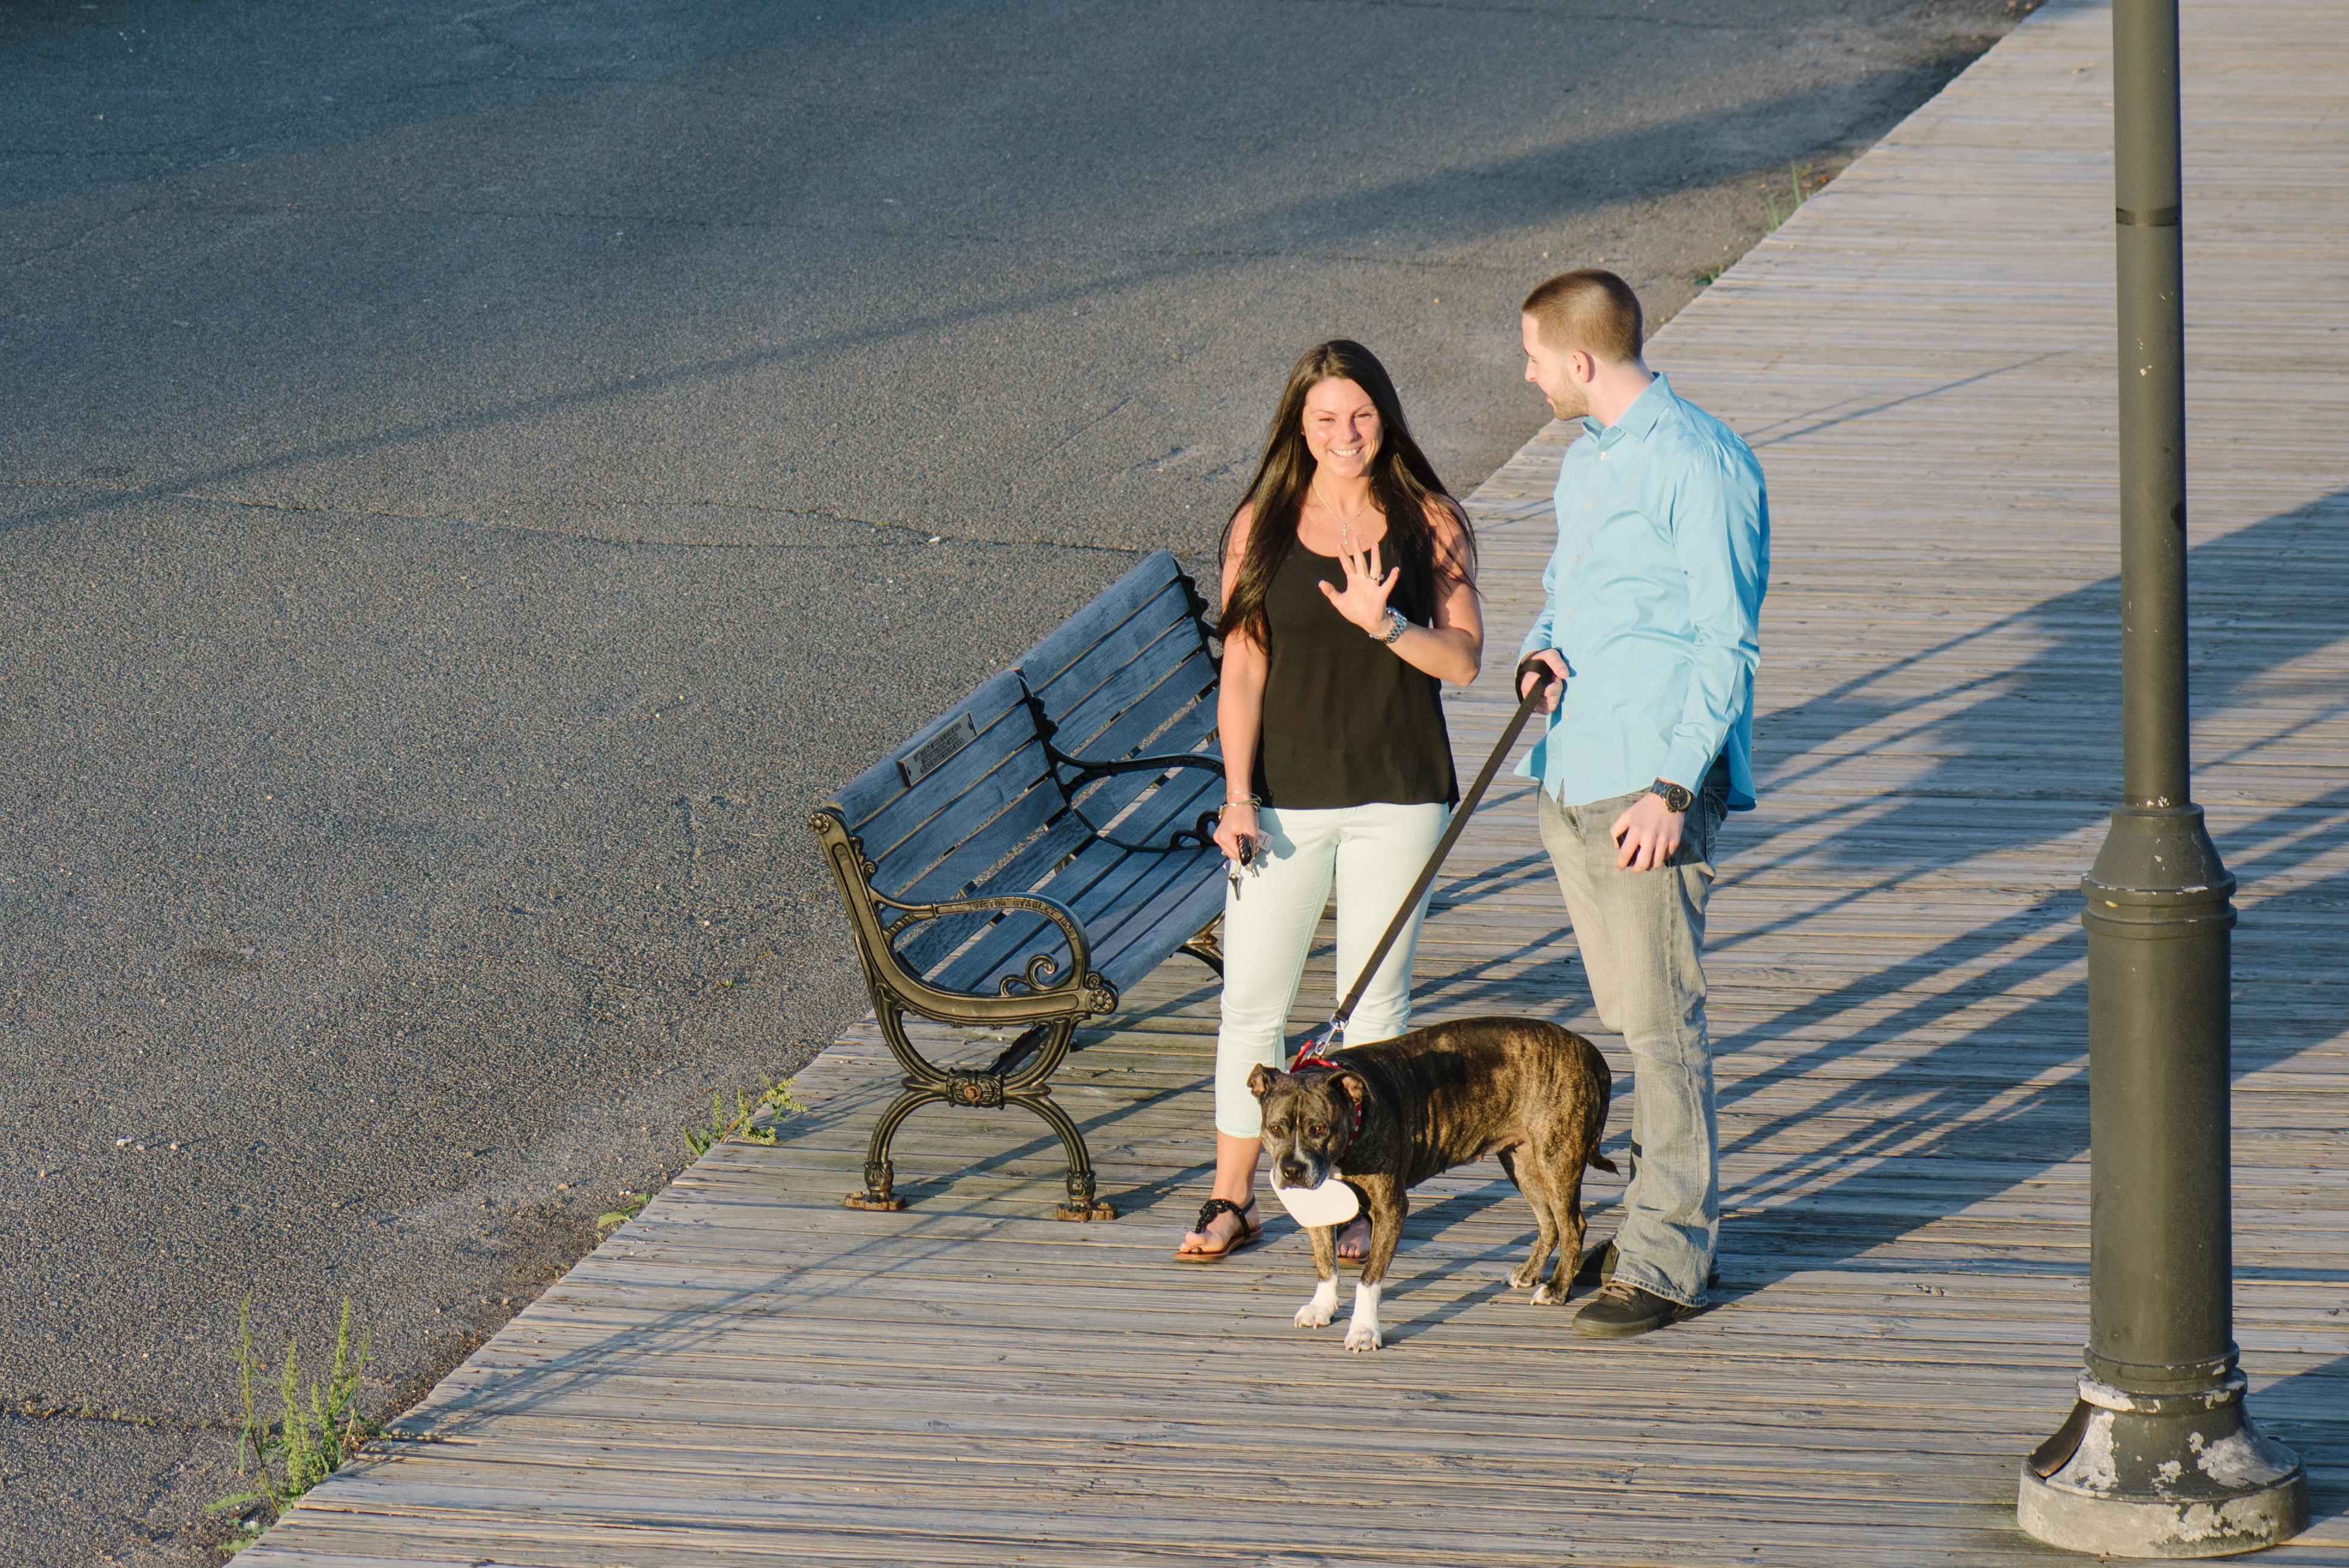 Image 7 of Dog Helps with Scavenger Hunt Proposal